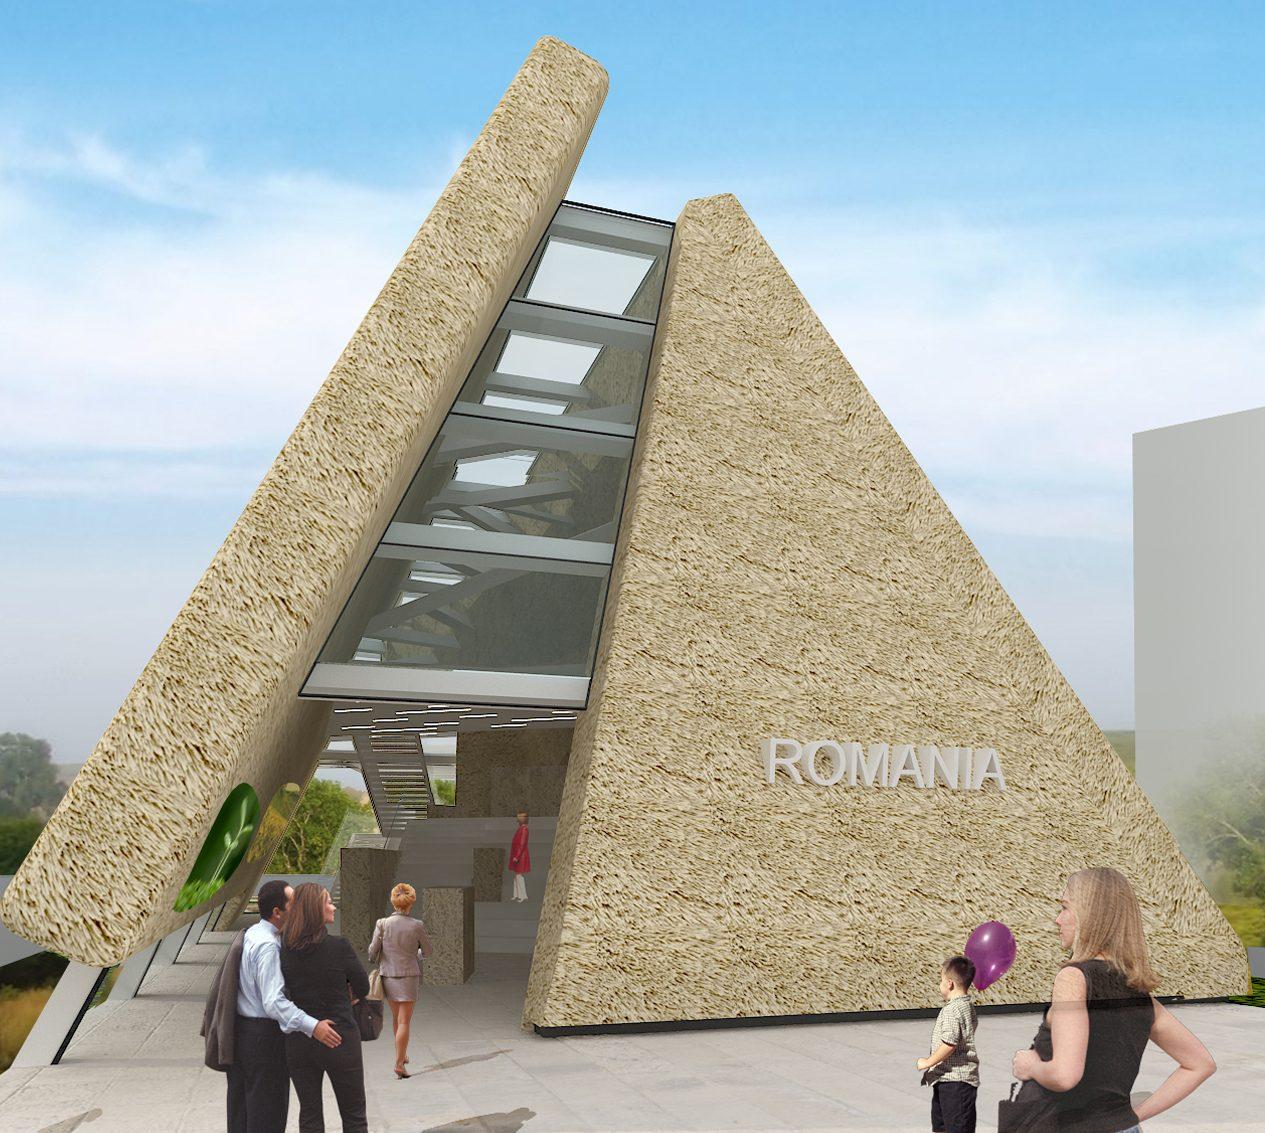 https://nbc-arhitect.ro/wp-content/uploads/2020/10/NBC-Arhitect-_-contests-_-Romanian-Pavillion-_-Milan-Expo-Contest-2015_1-e1604321911614.jpg